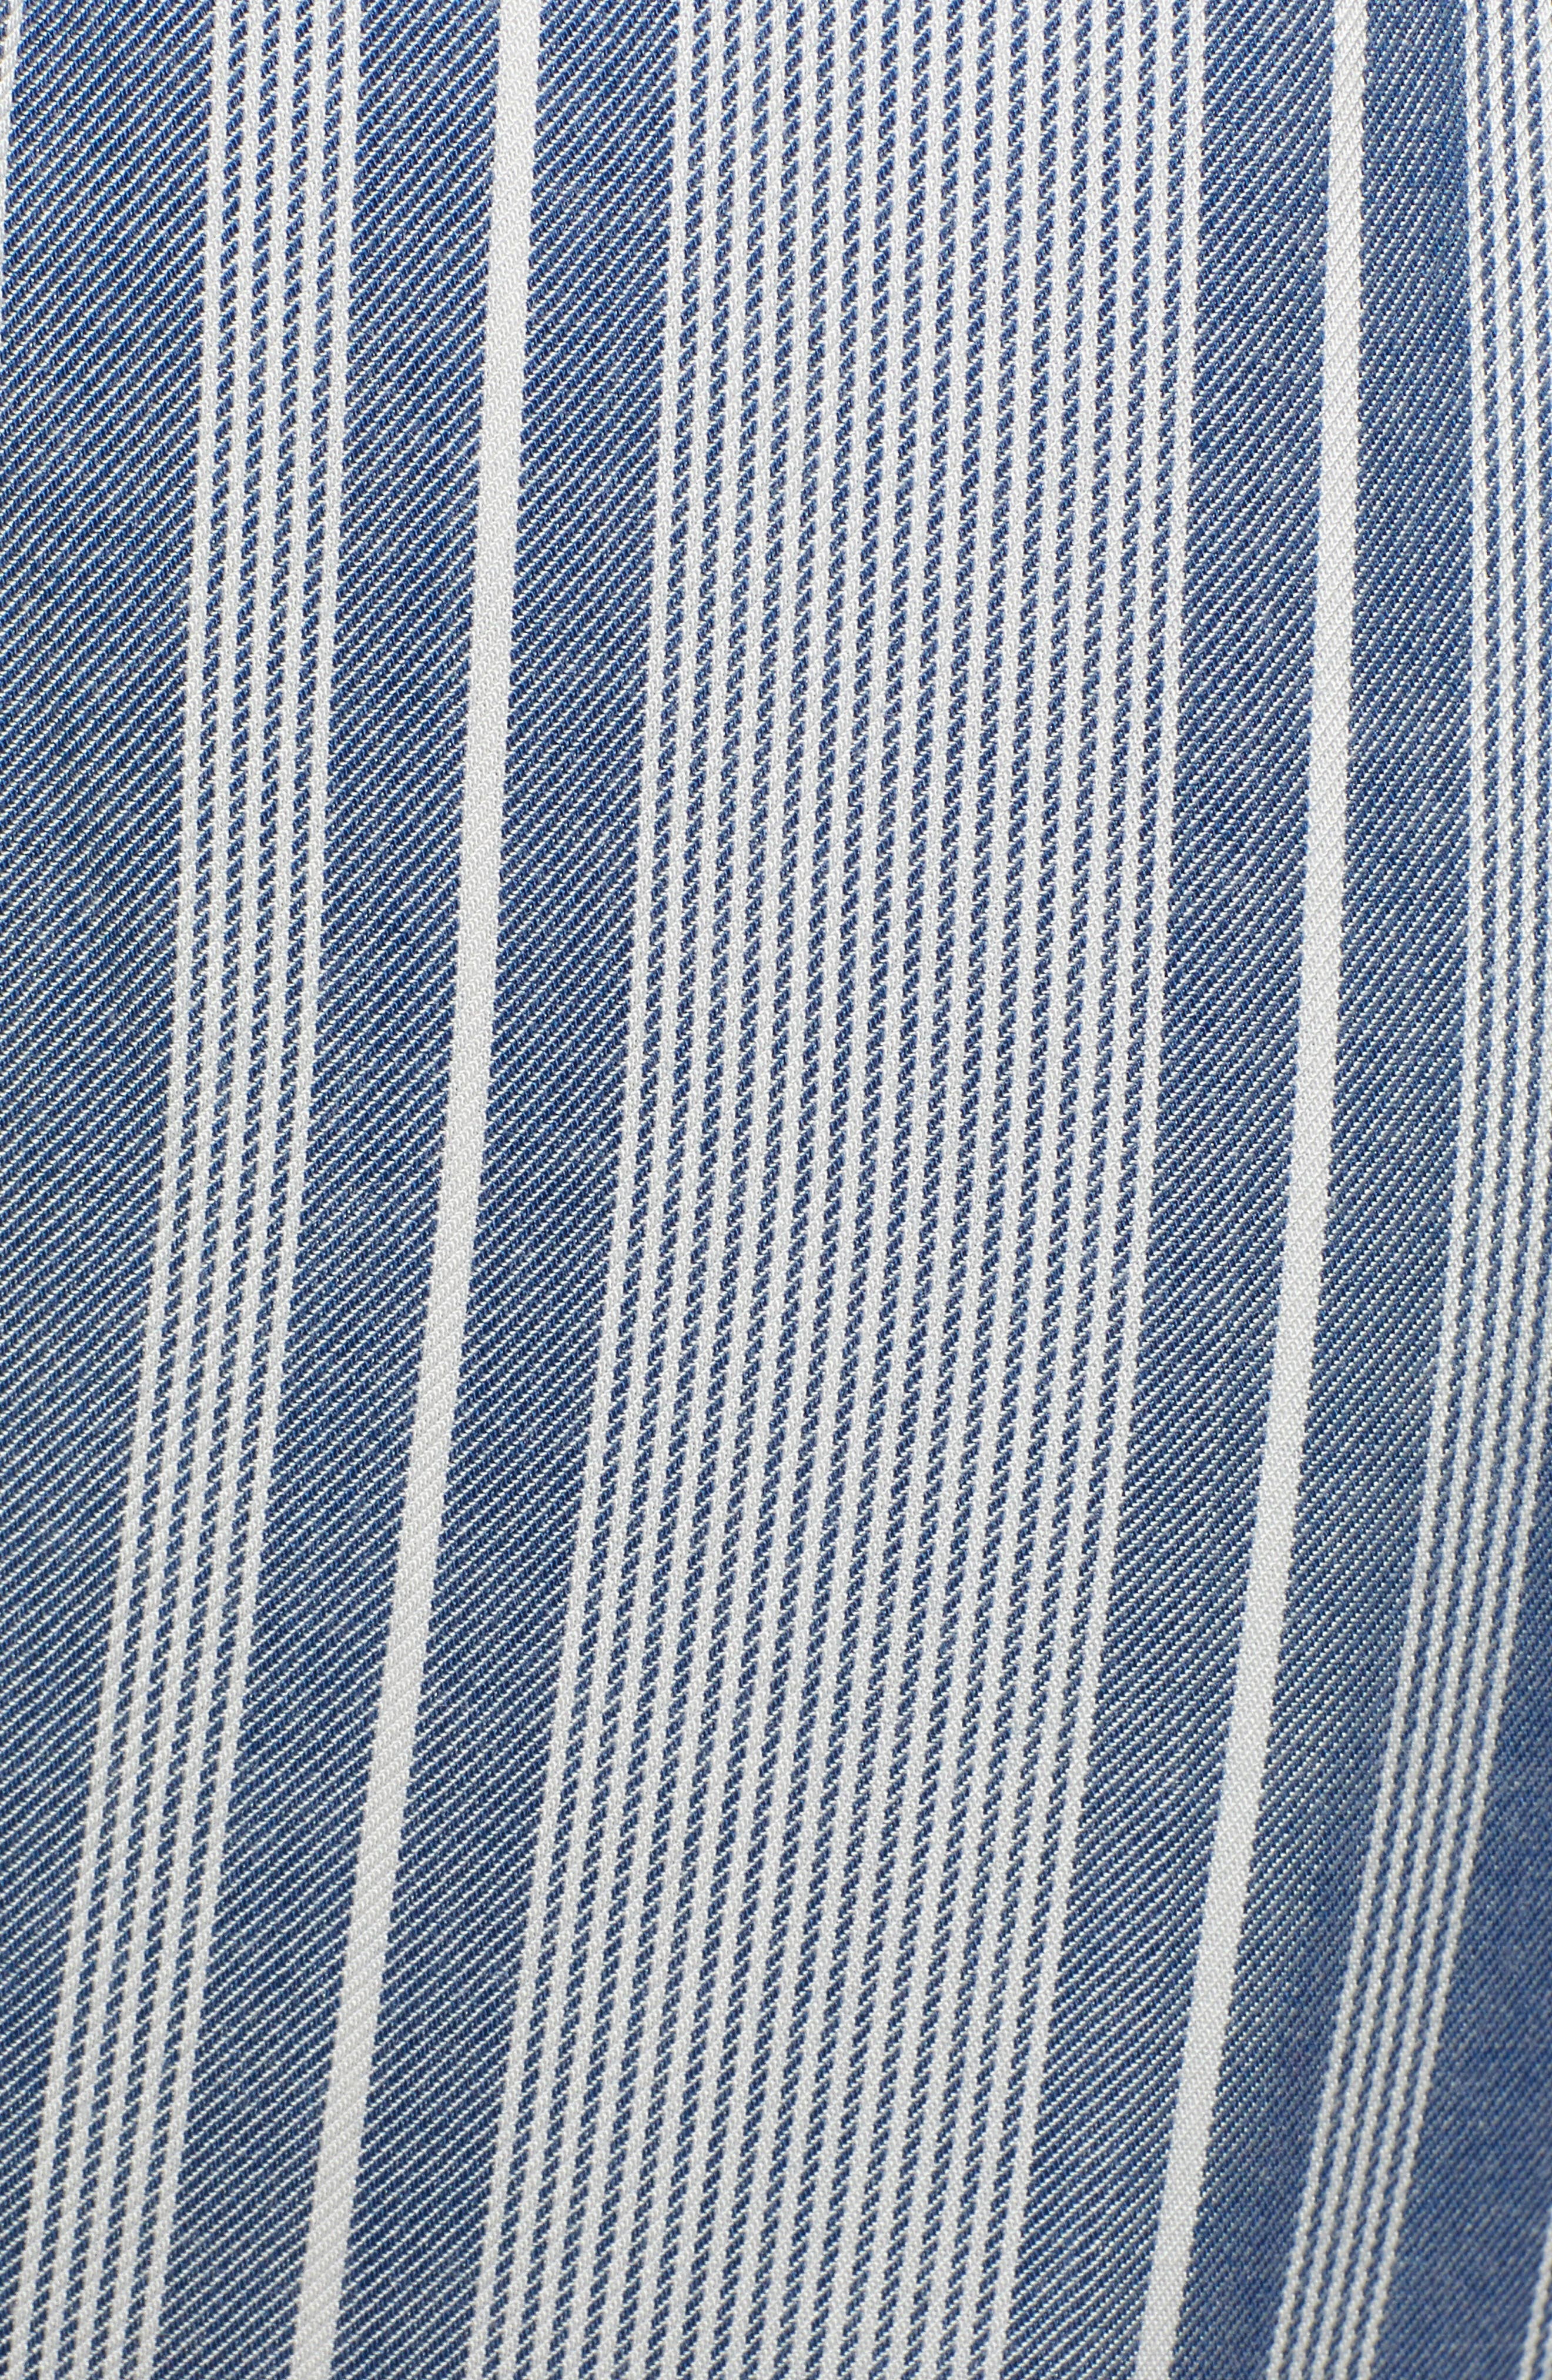 Jessa Stripe Tulip Hem Pants,                             Alternate thumbnail 6, color,                             MARSHMALLOW EMBROIDERED FLORAL